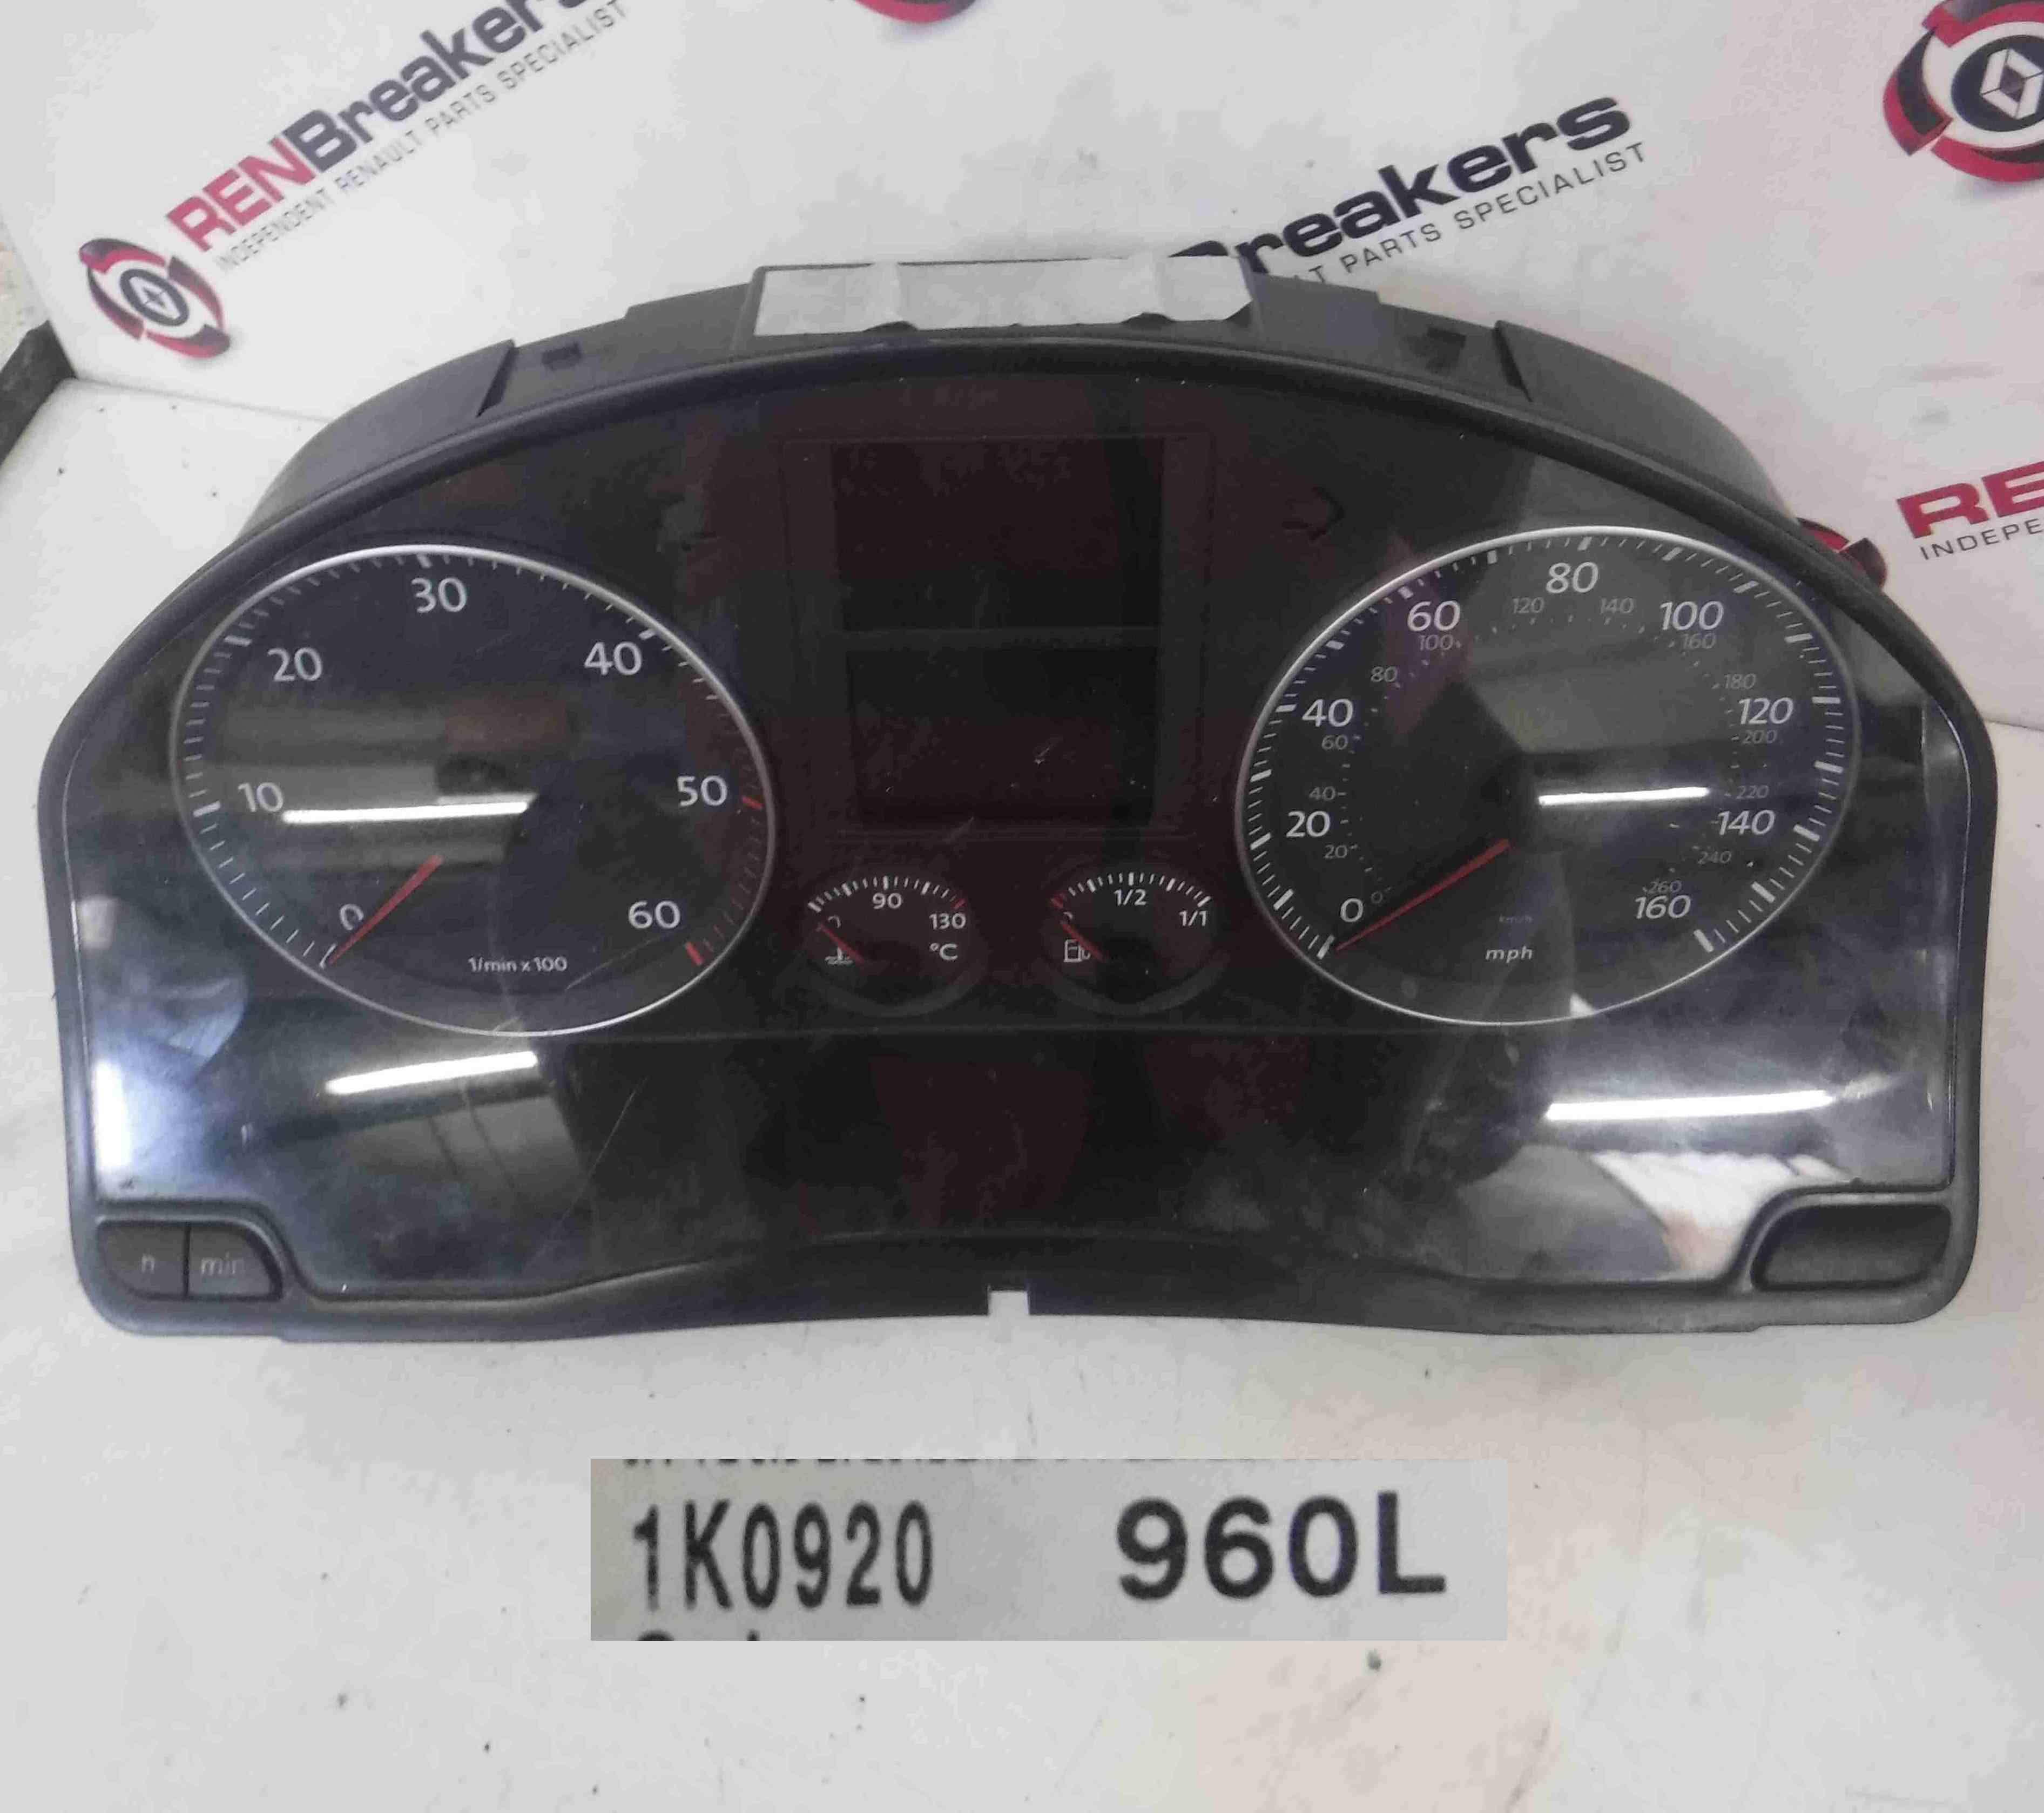 Volkswagen Golf MK5 2003-2009 Instrument Panel Dials Gauges Clocks